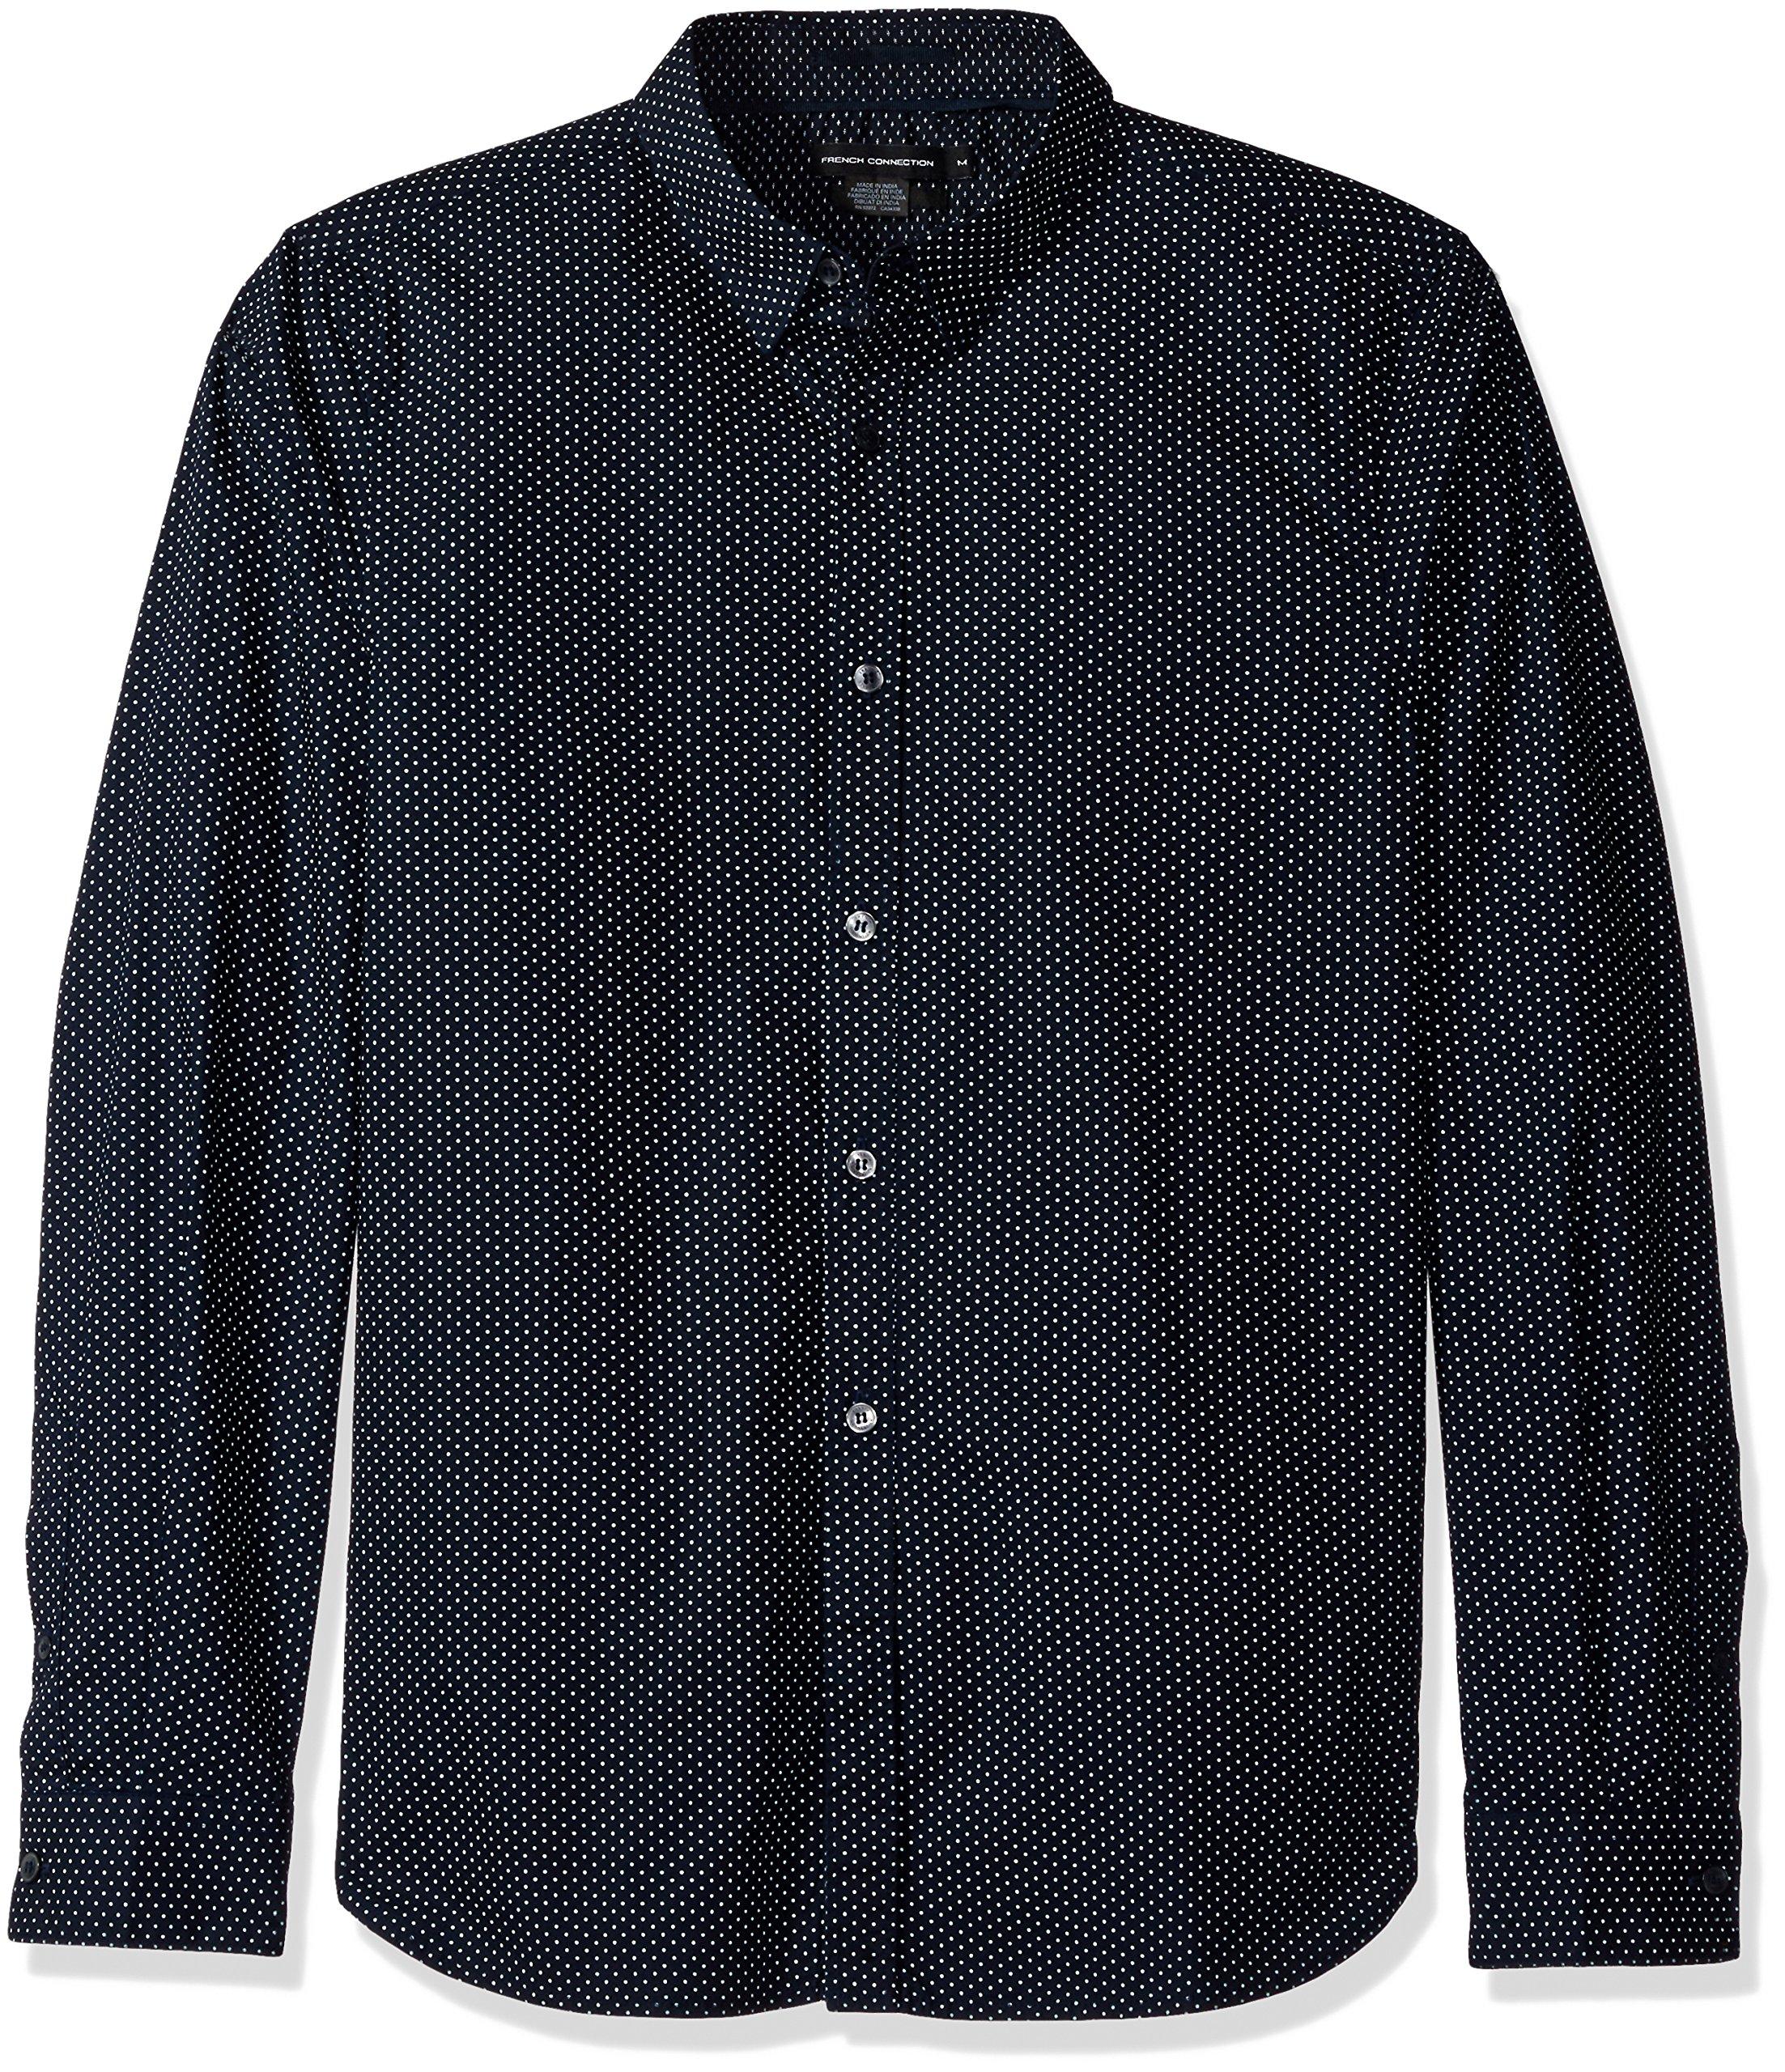 French Connection Men's Summer Dot Shirt, Marine Blue/White, L